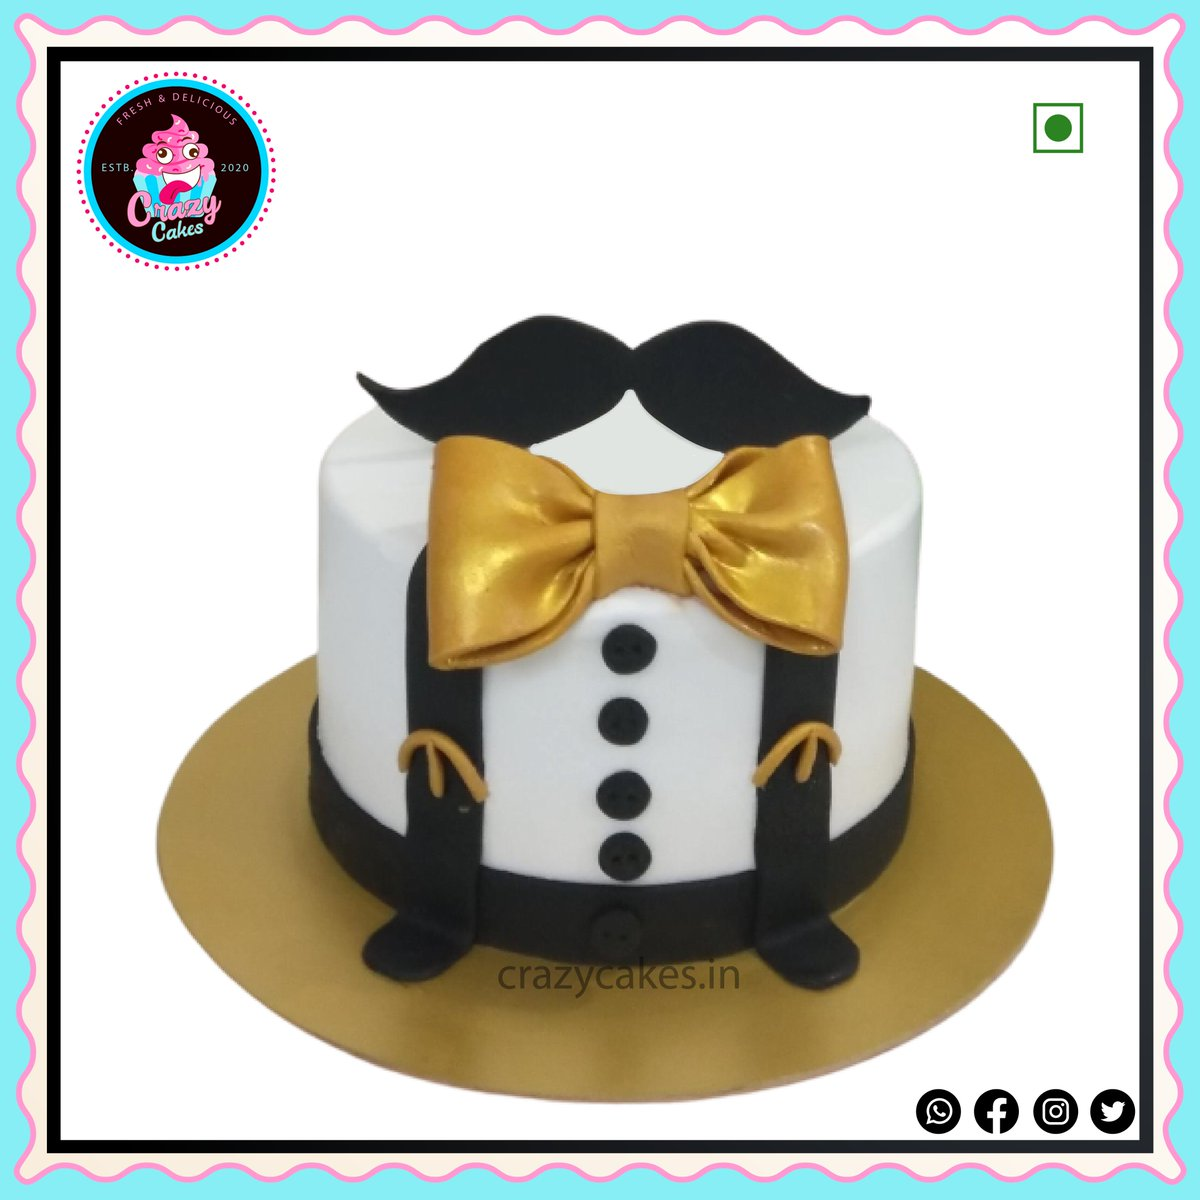 Tuxedo theme cake. DM to get your customized cake now. WhatsApp or Call +918983019702 #customizedcake #crazycakes #cakelover #100%eggless #party #Punecity #cc #delicious #facebook #cakeoftheday #cakedesigner #ordernow #photocake #instagram #fondantcake #follow #like Crazy Cakes.